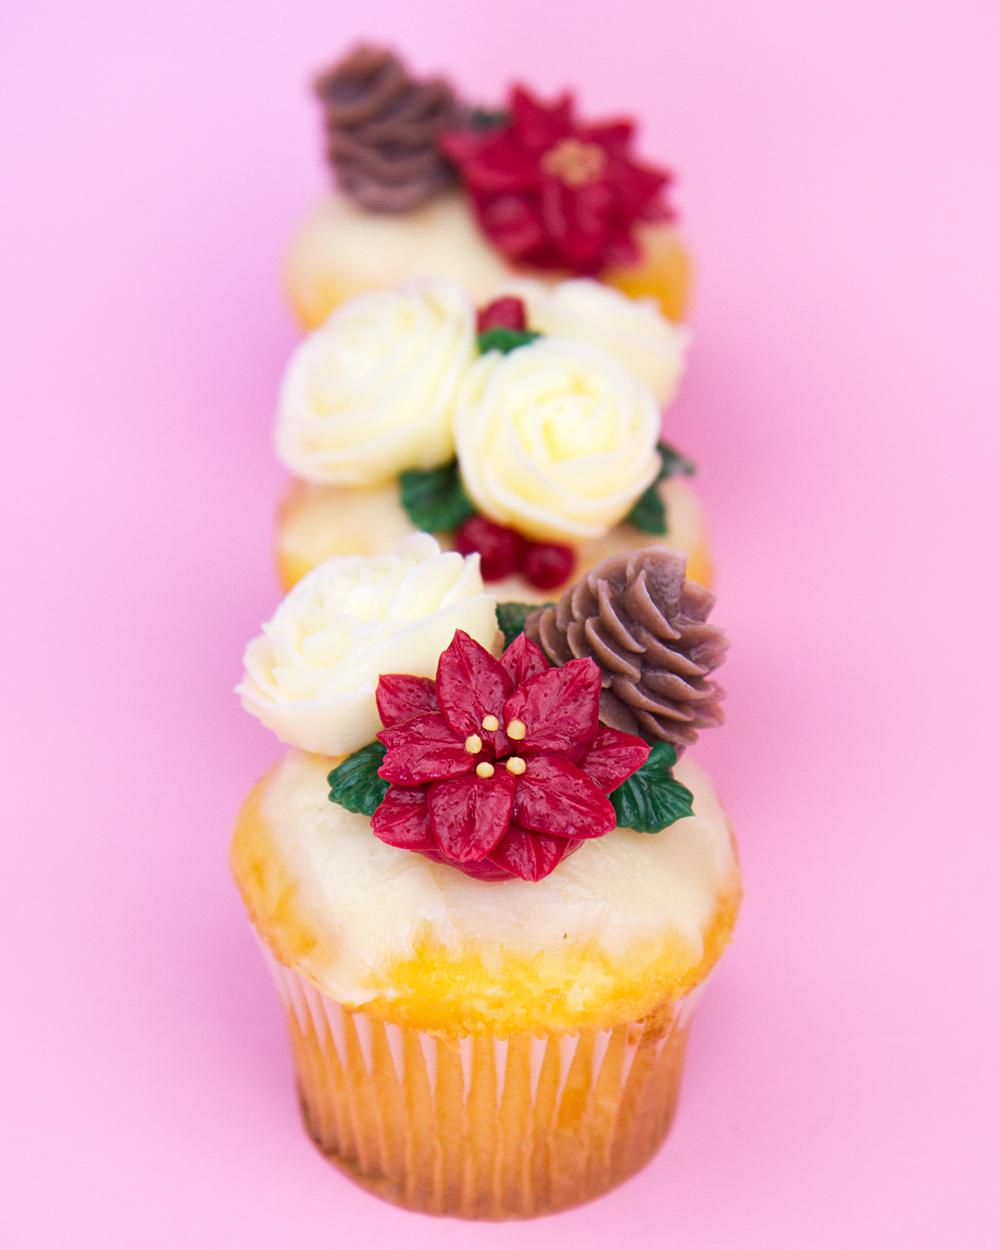 cupcakes_NL.jpg